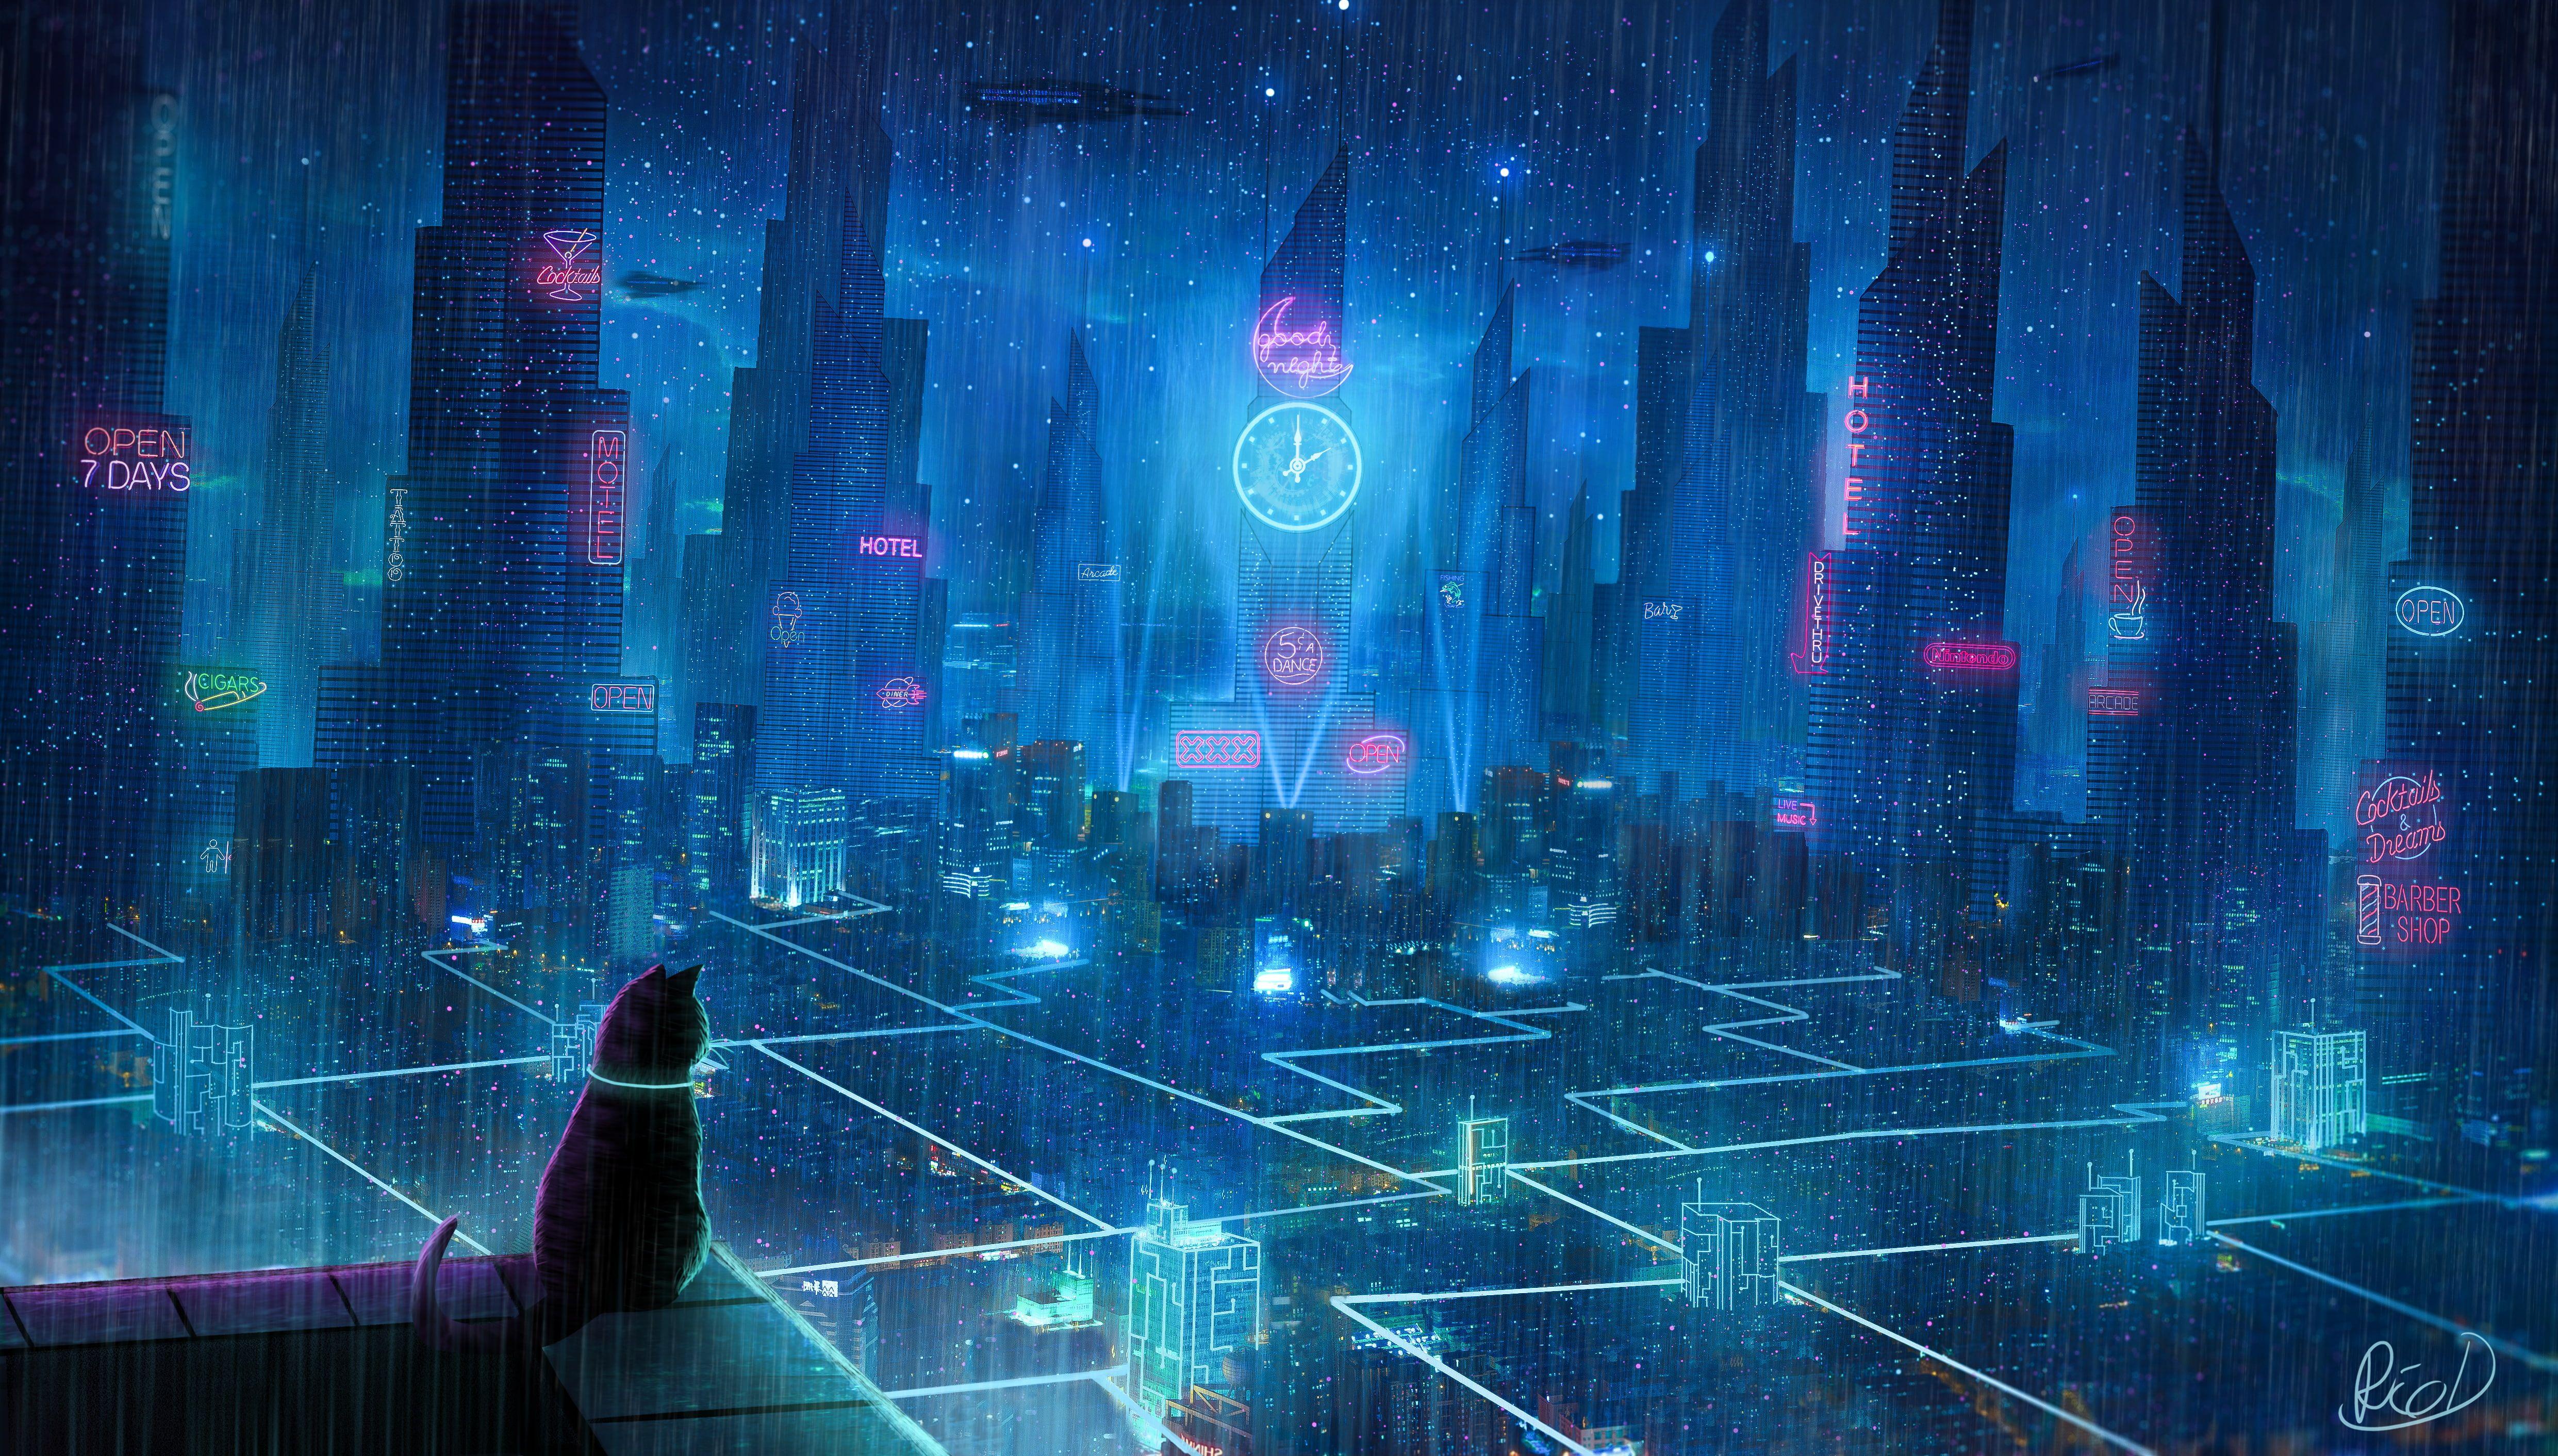 Cat Roof City Neon Lights Metropolis Future Cyberpunk 4k Wallpaper Hdwallpaper Desktop In 2021 Cyberpunk City Rain Wallpapers Cyberpunk